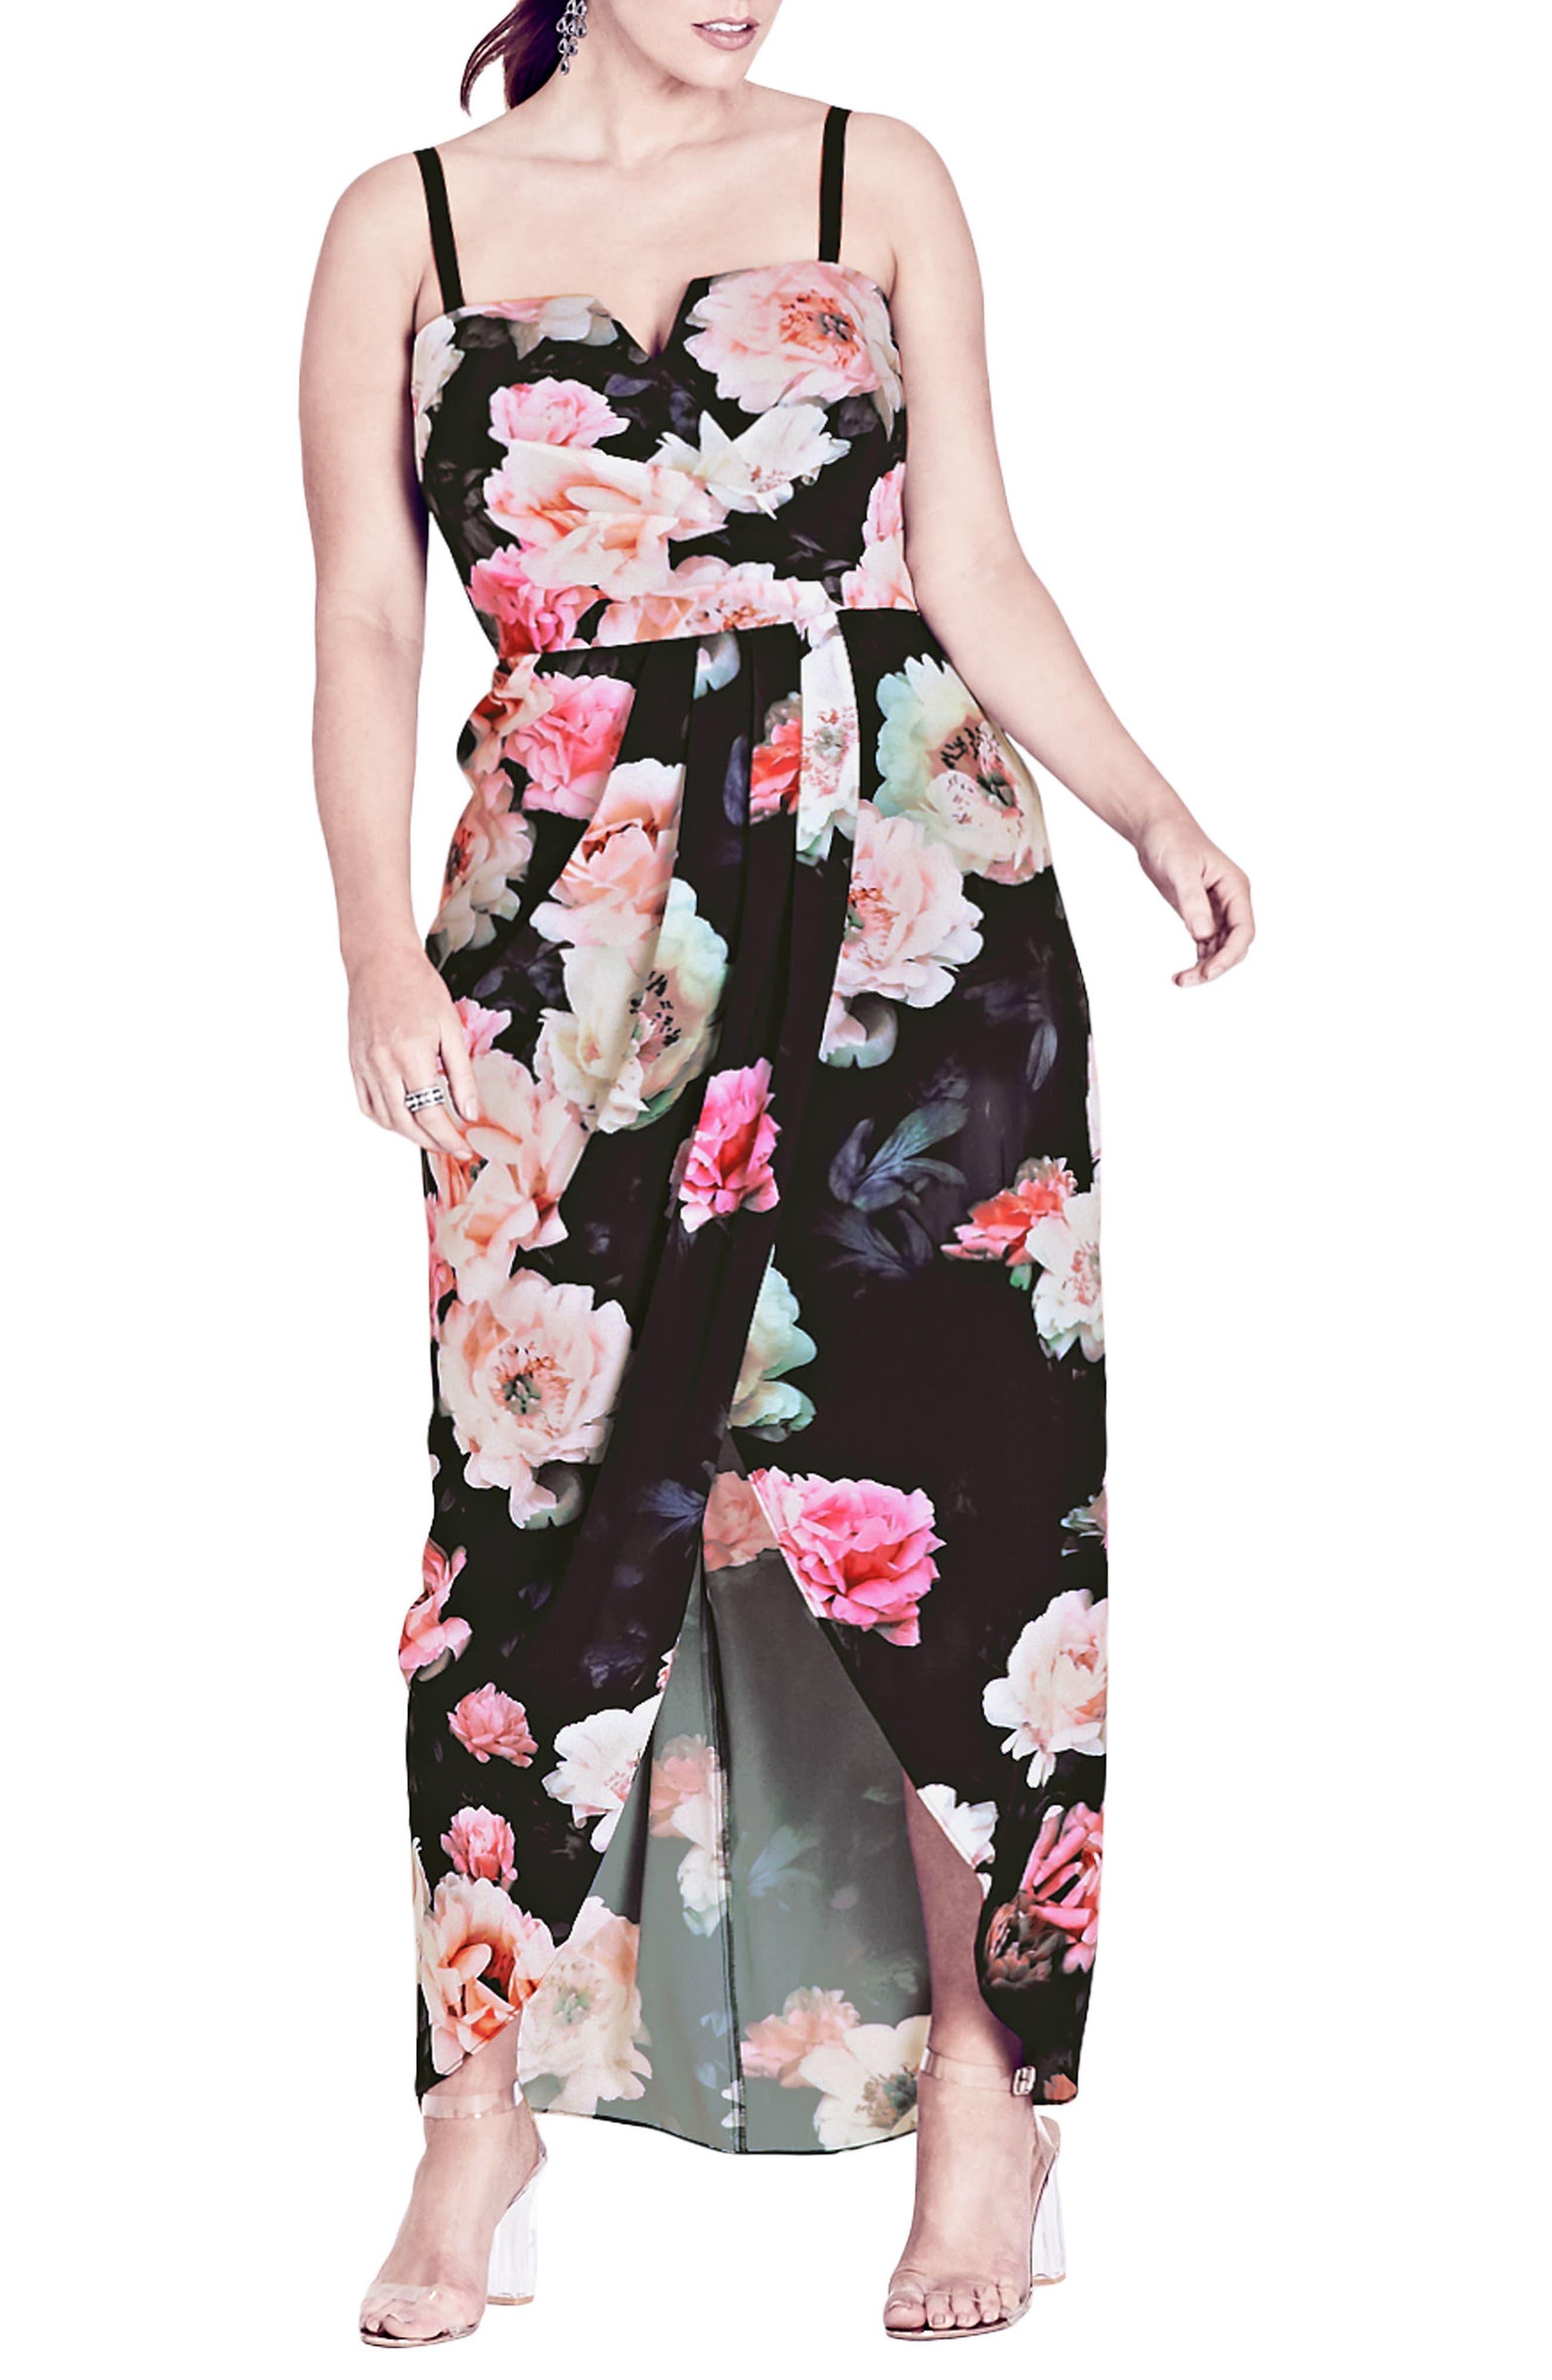 Wonderland Floral Maxi Dress,                             Main thumbnail 1, color,                             Pink Floral